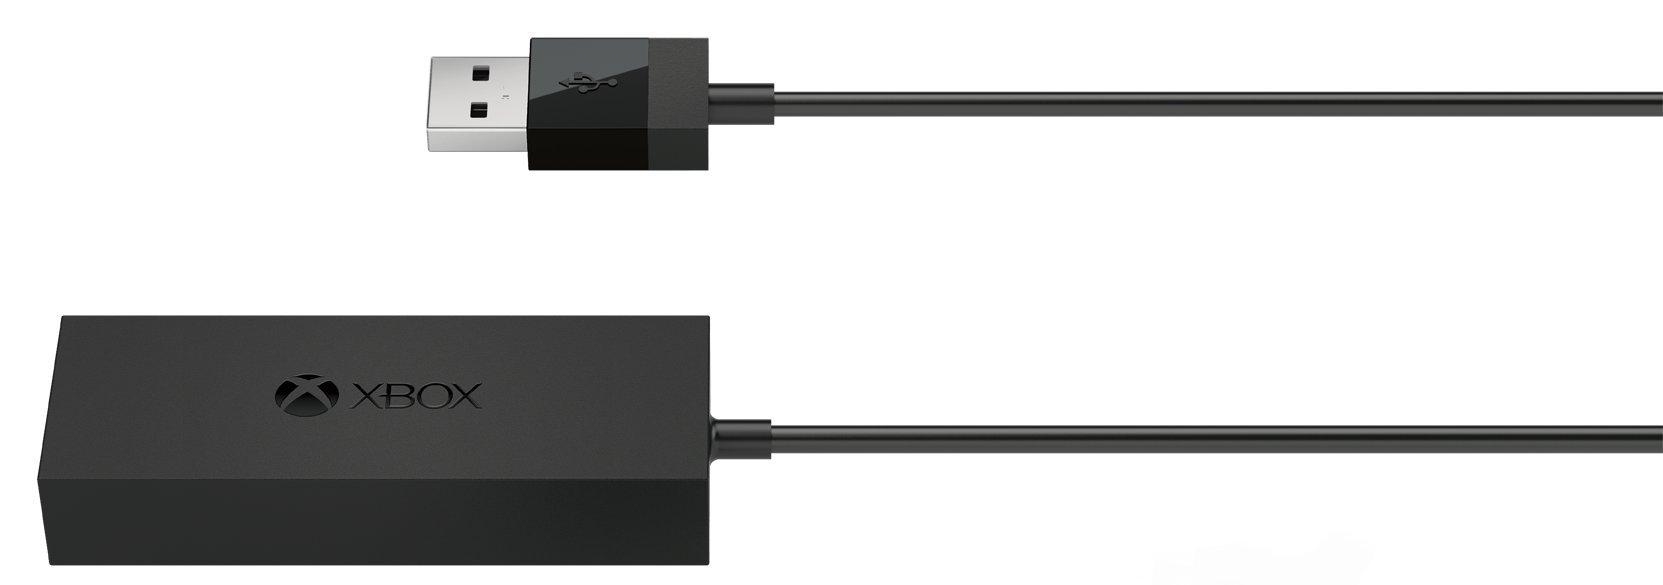 Microsoft Tarjeta de captura XBOX One Digital TV Tuner, negro: Amazon.es: Electrónica